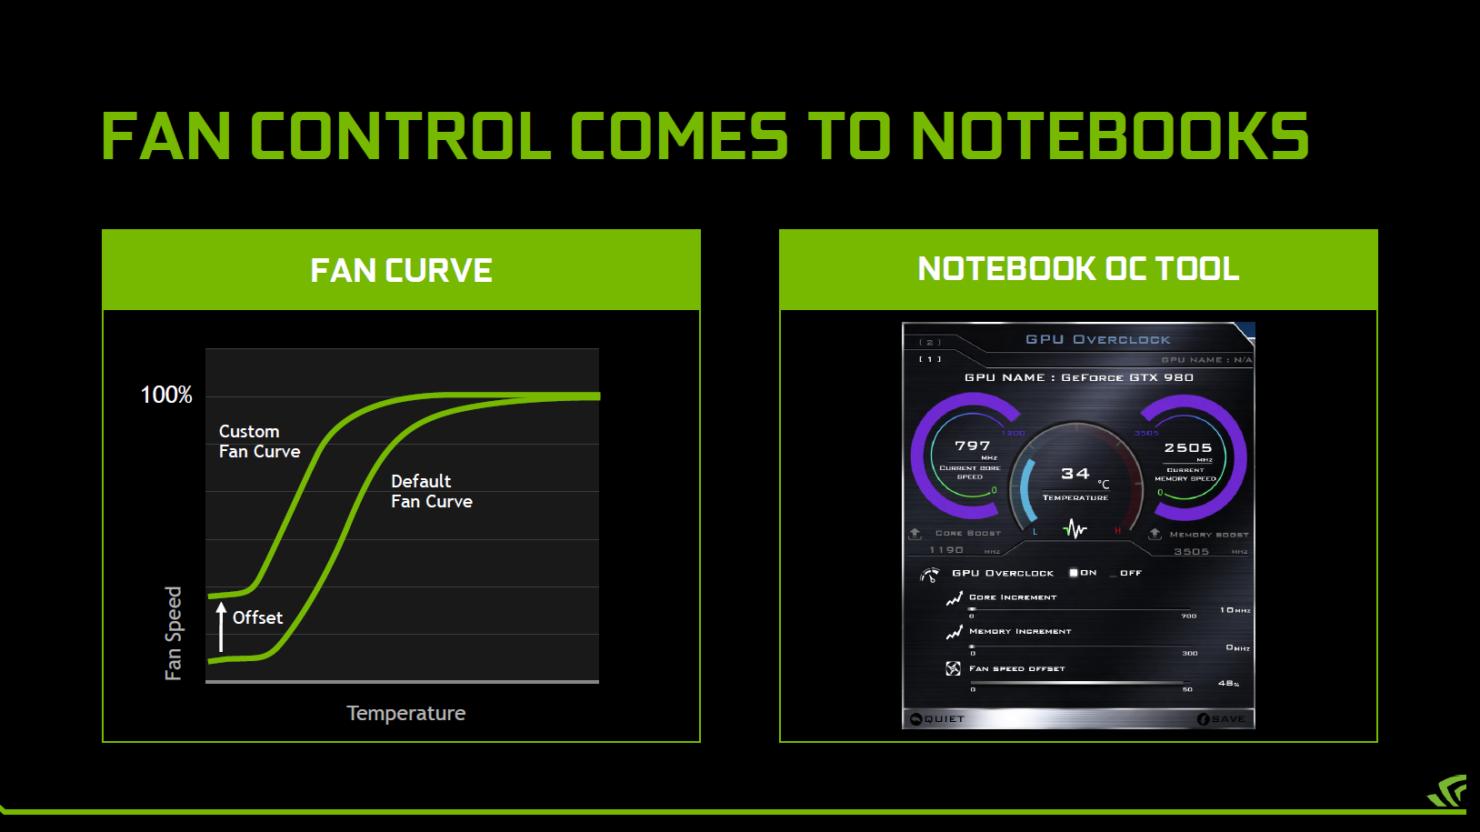 nvidia-geforce-gtx-980_laptop_overclocking